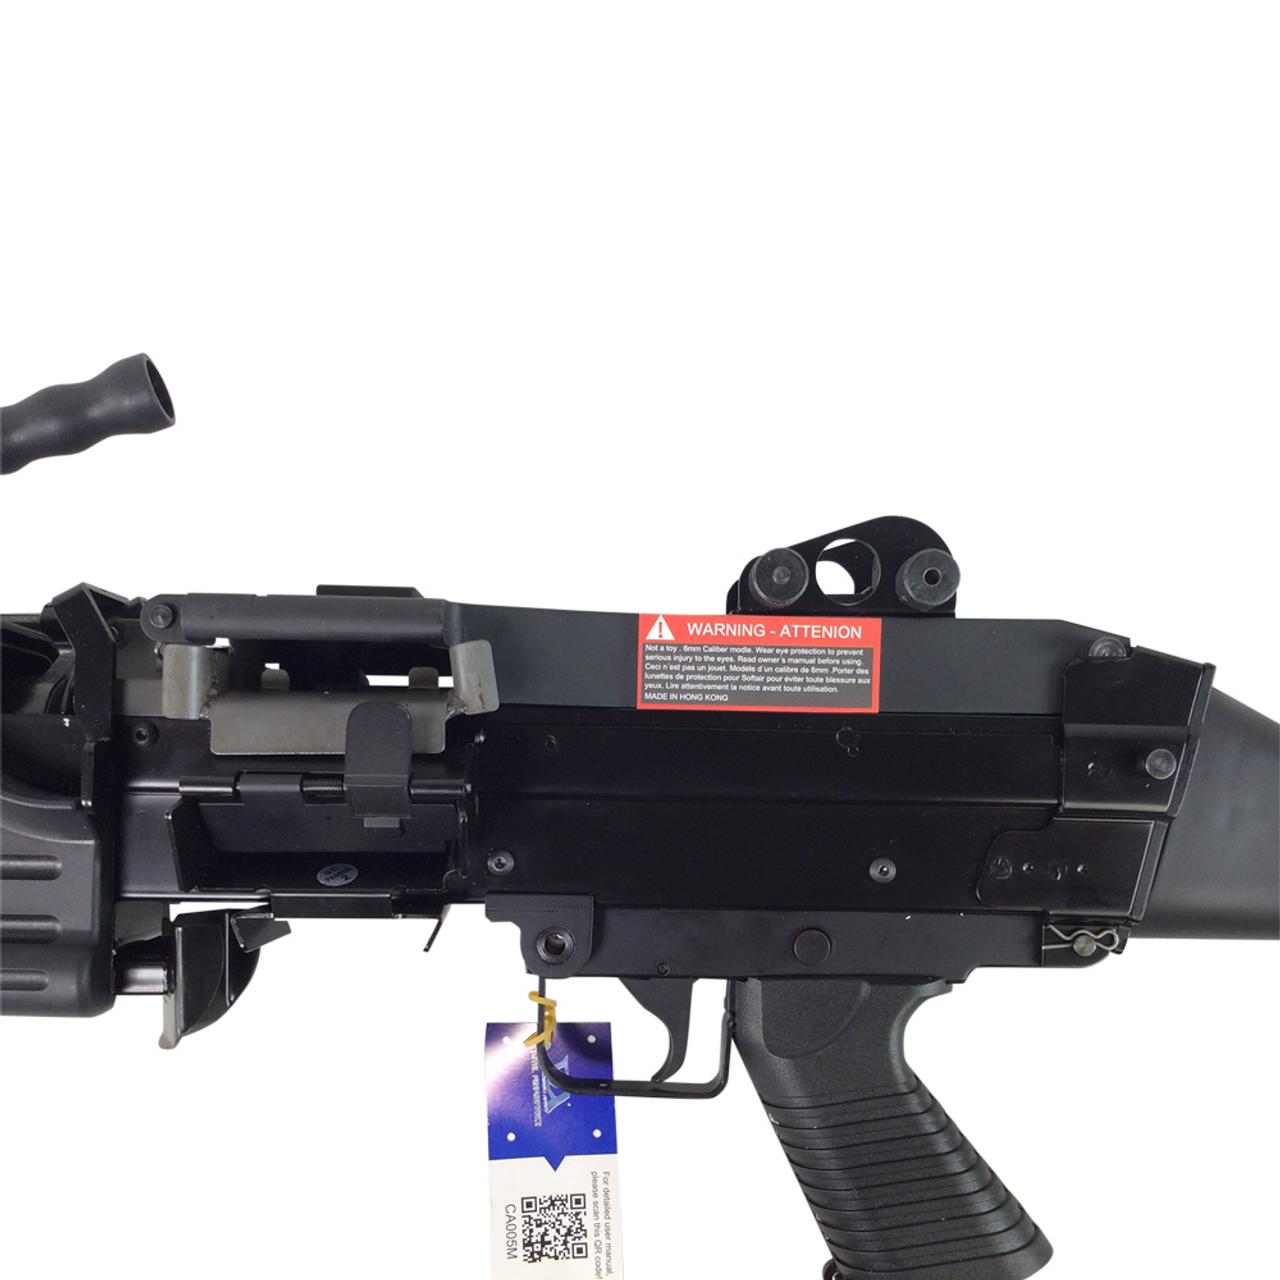 CLASSIC ARMY M249 MKII SAW AIRSOFT LMG AEG - BLACK